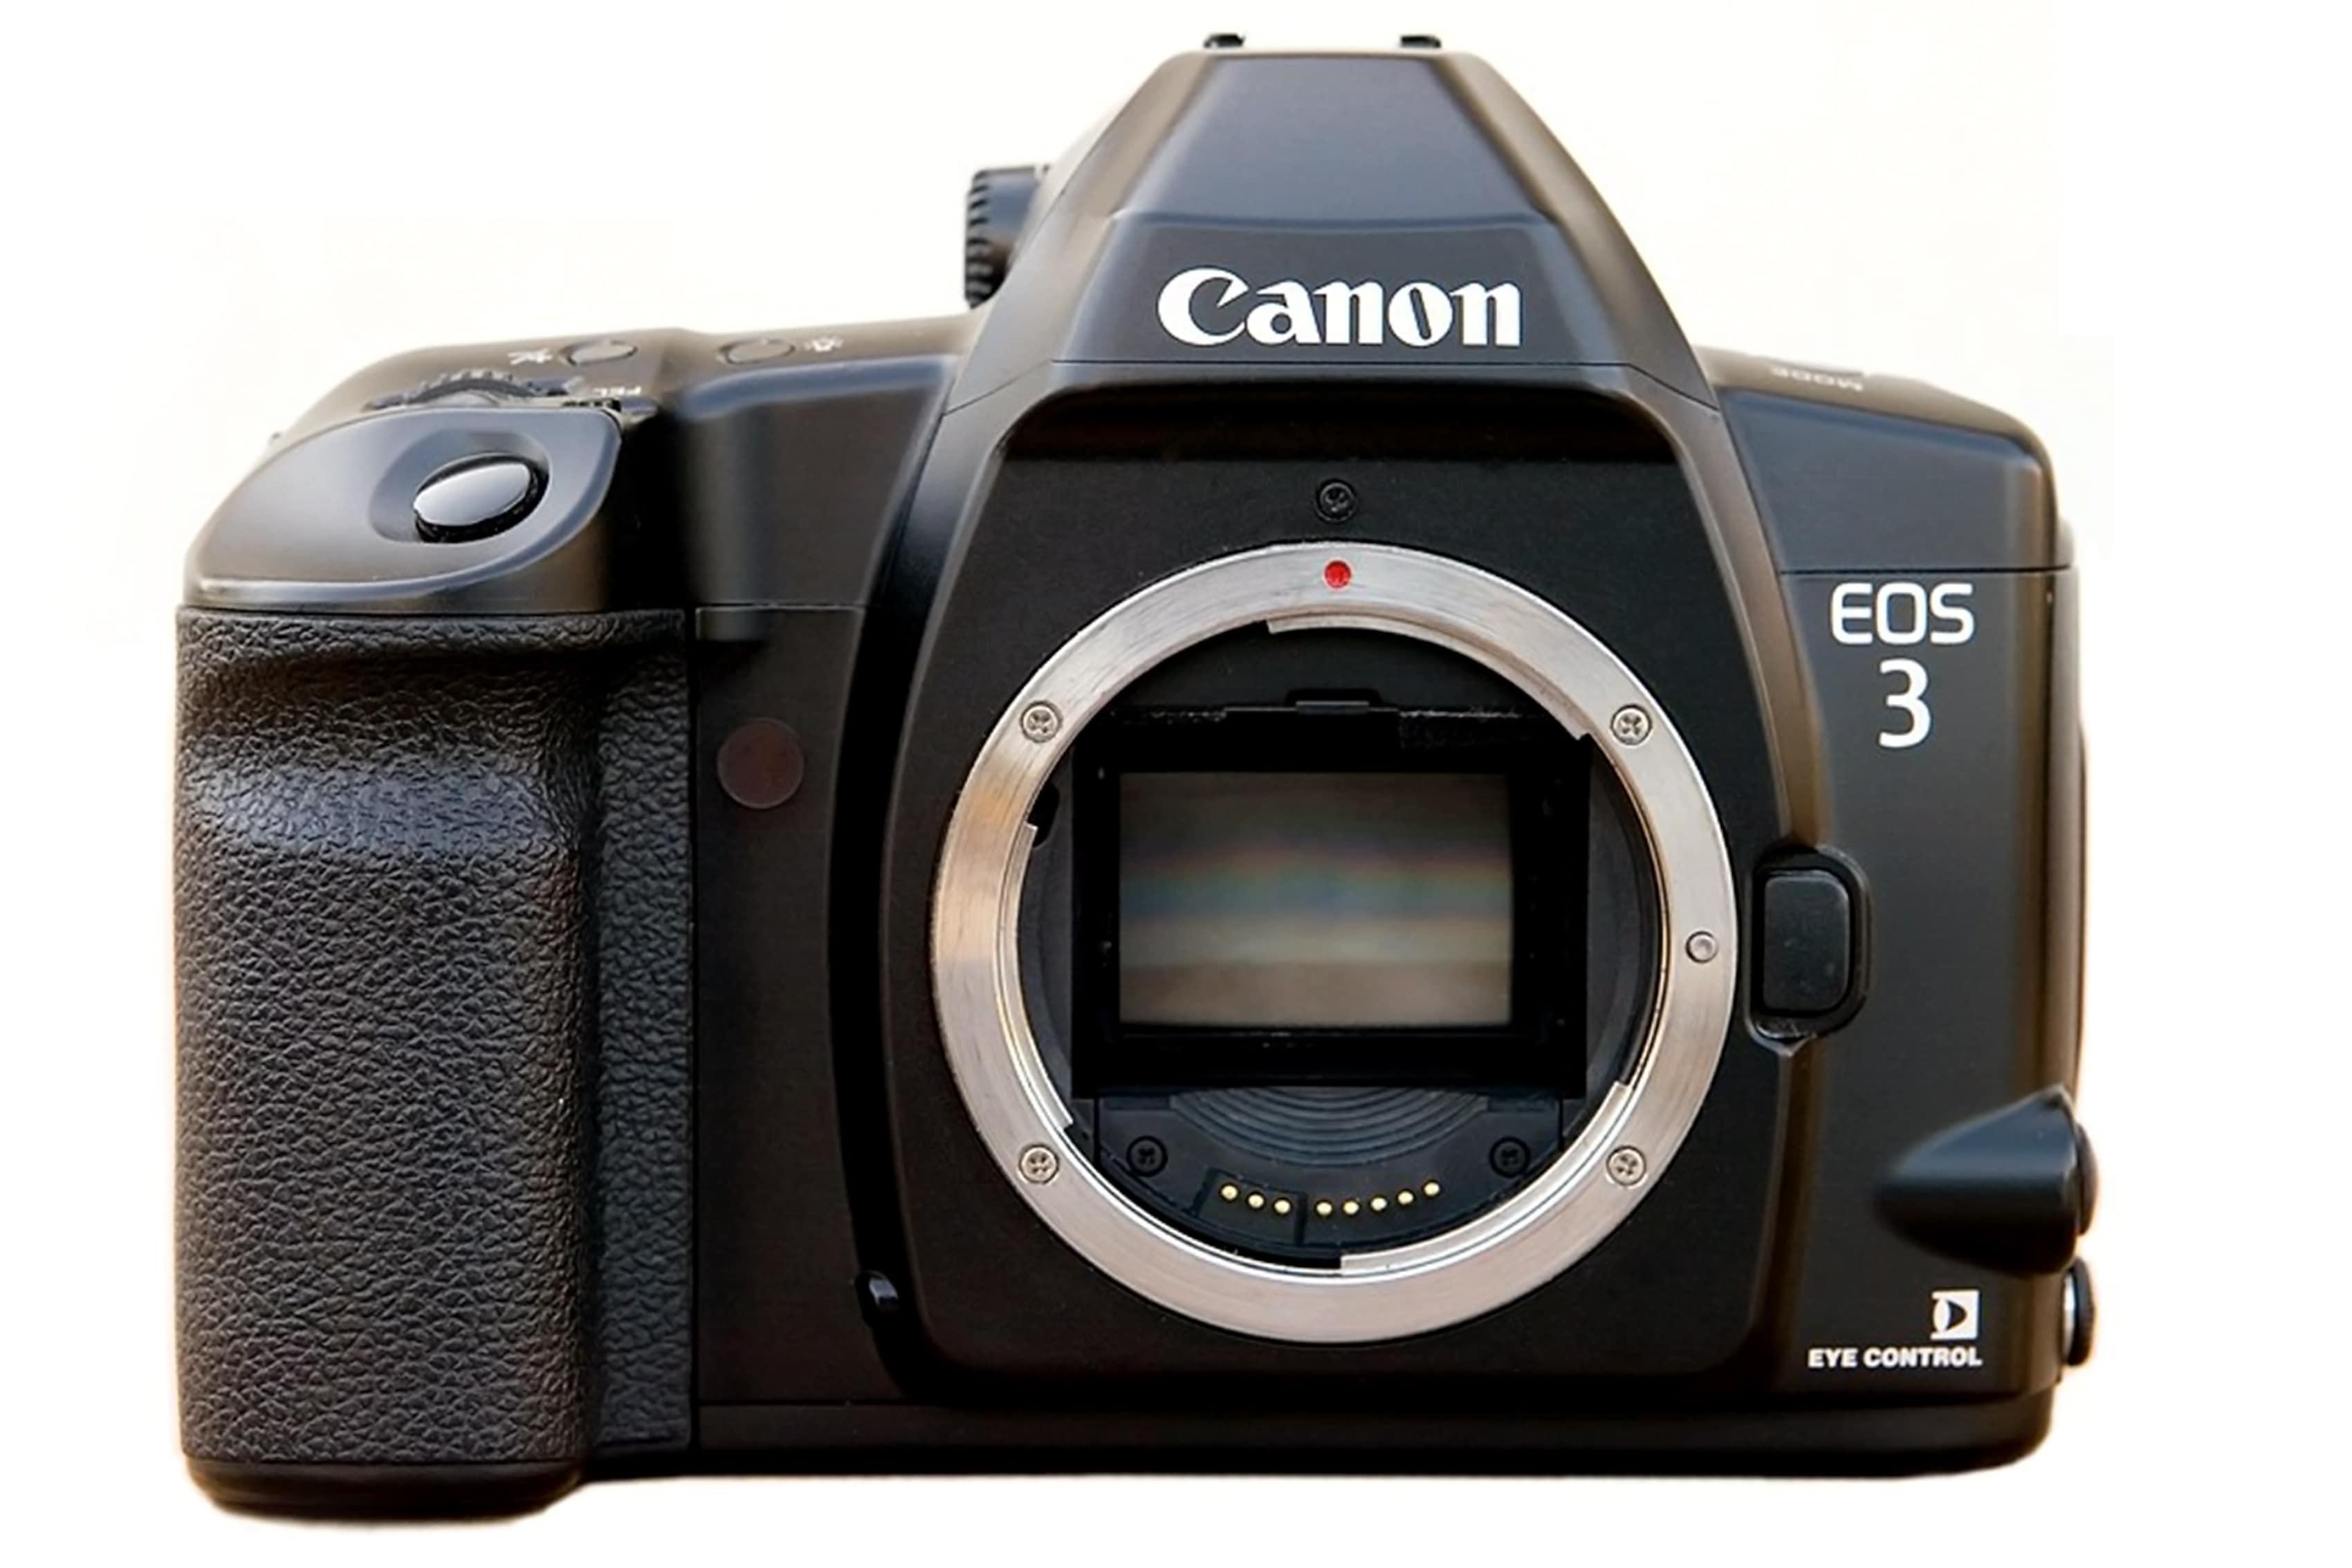 Canon EOS 3 Film Camera from 1998